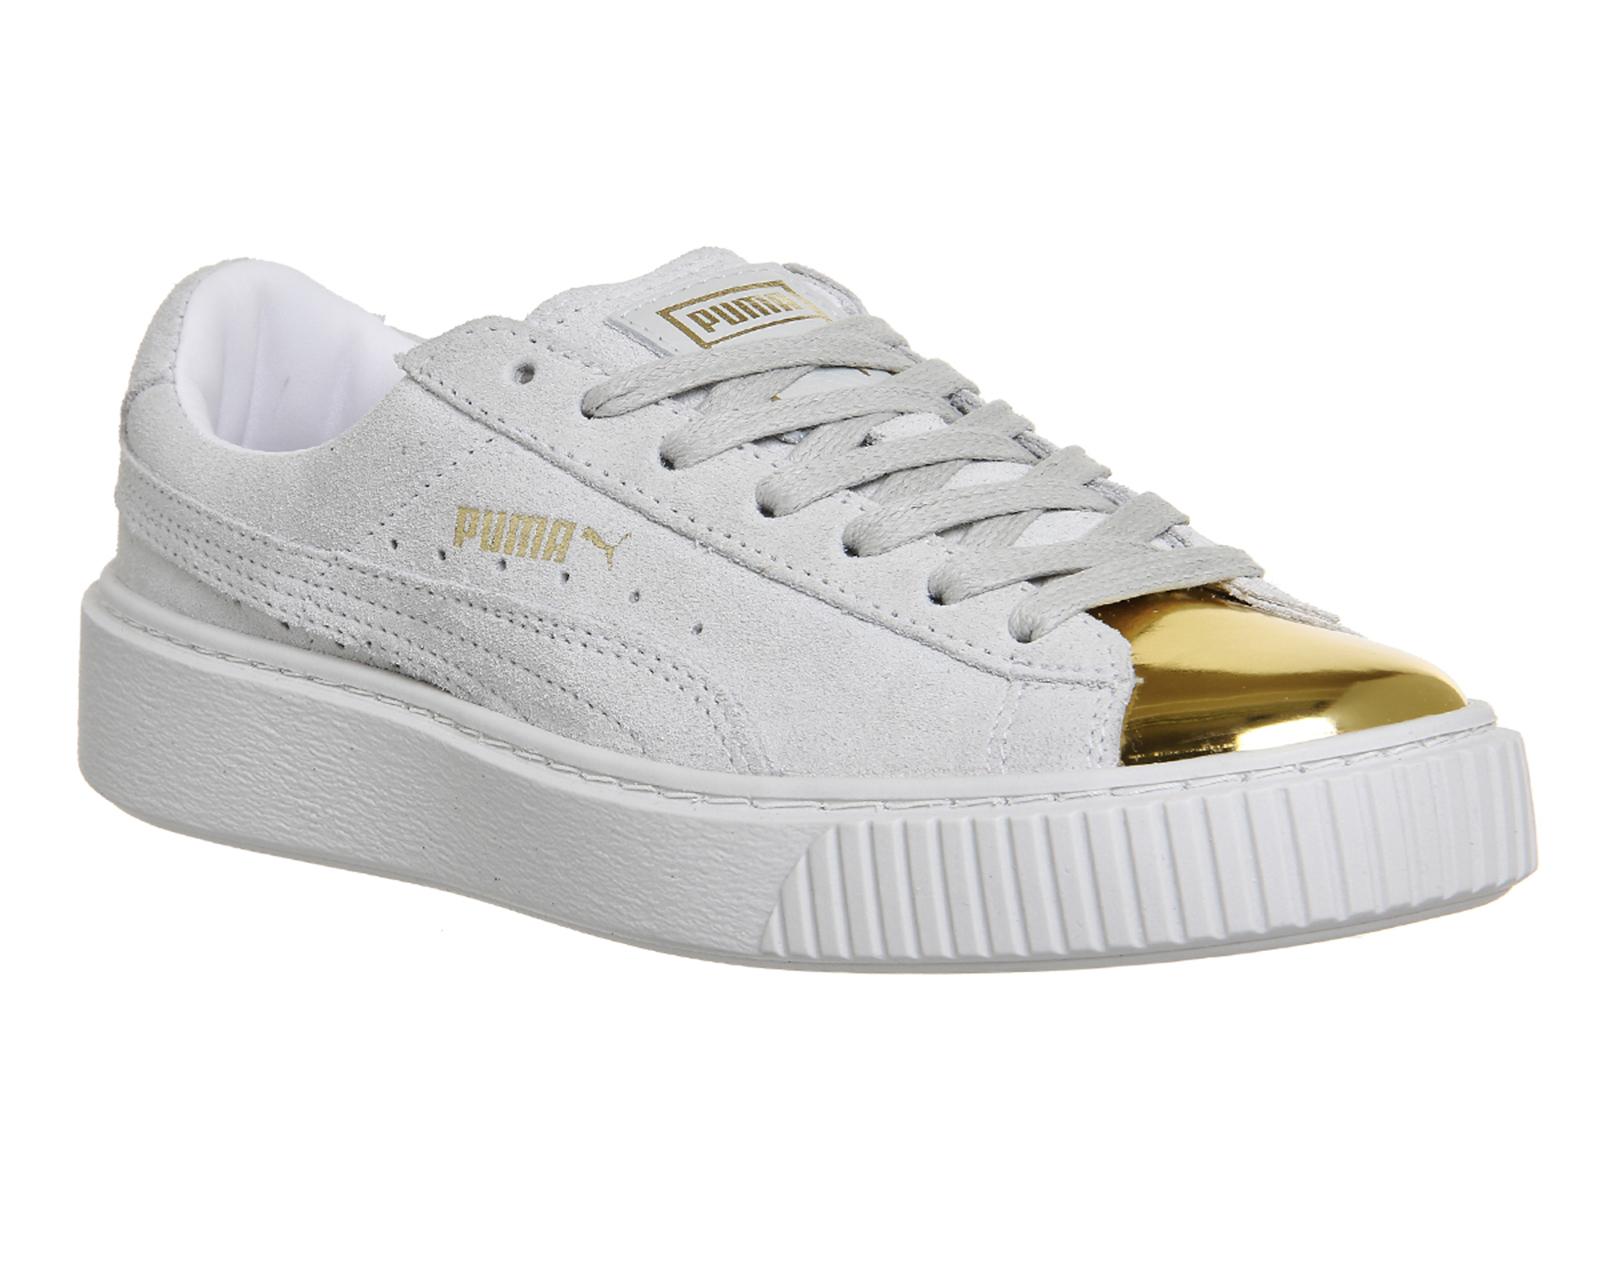 puma suede platform grey gold toe white trainers shoes ebay. Black Bedroom Furniture Sets. Home Design Ideas